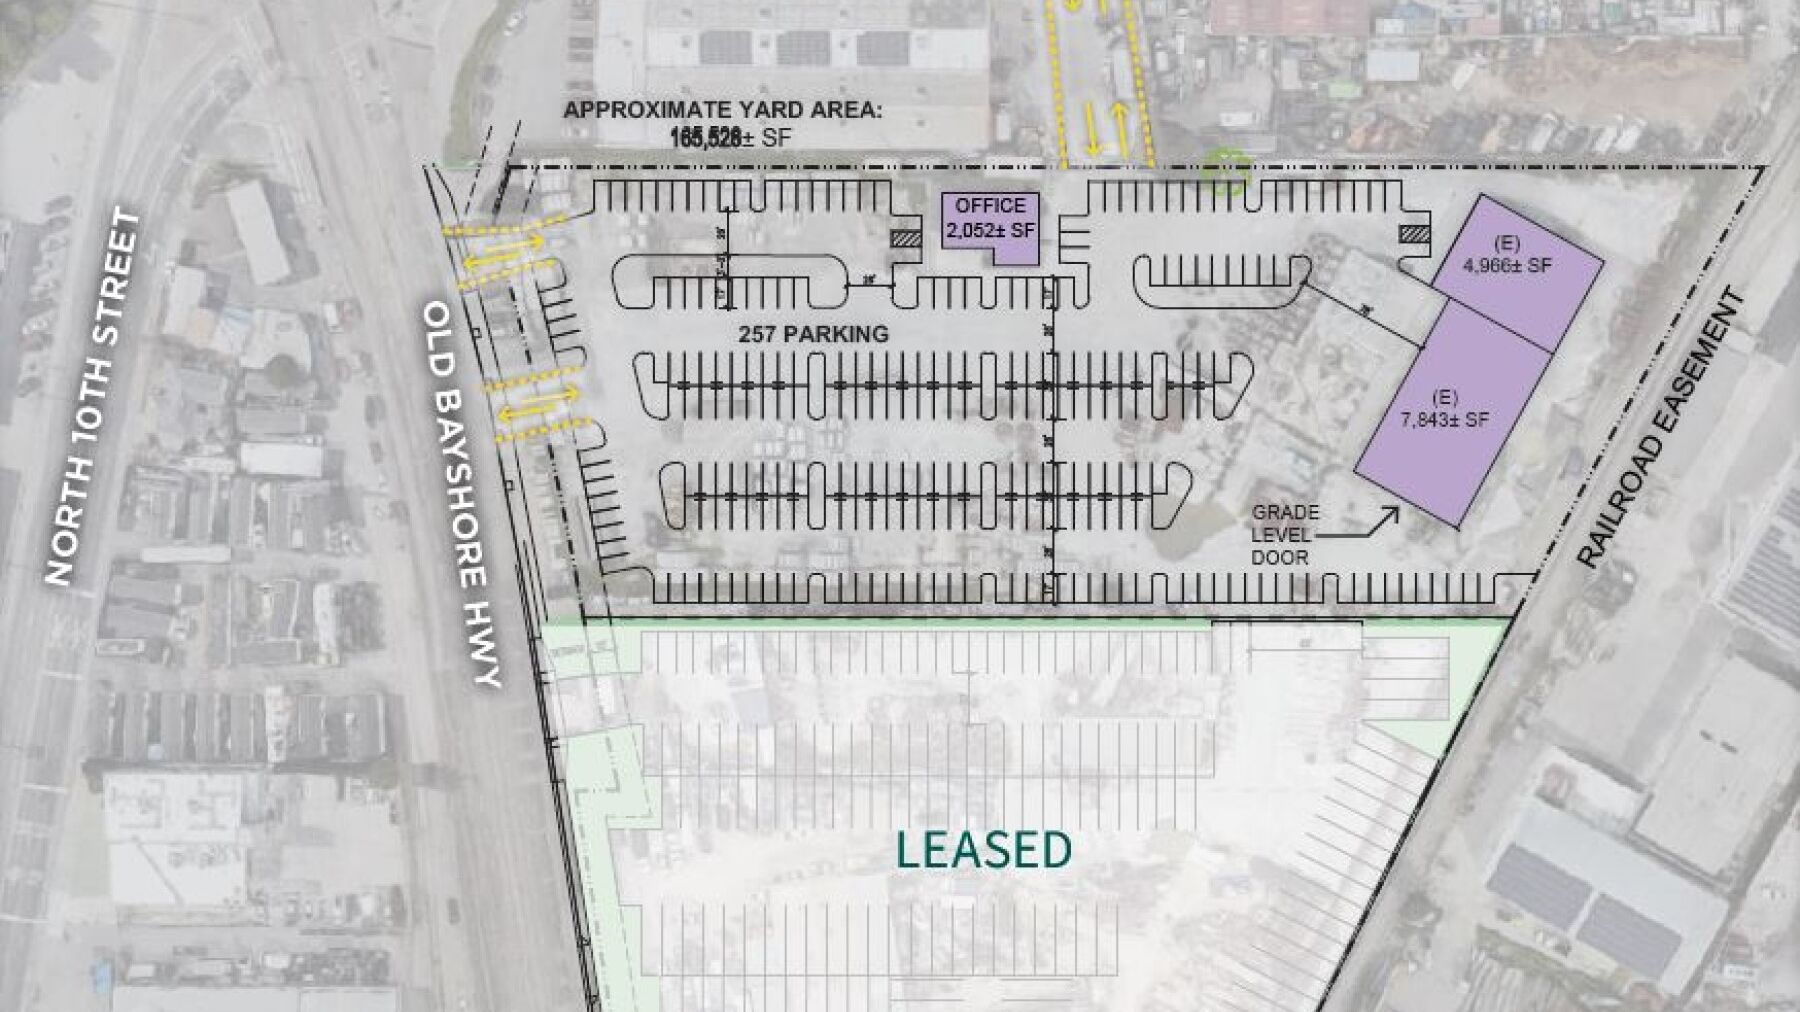 DPM-1420-Old-Bayshore-Hwy-North-San-Jose-46-g-iig158-Yard-Site-Plan.jpg